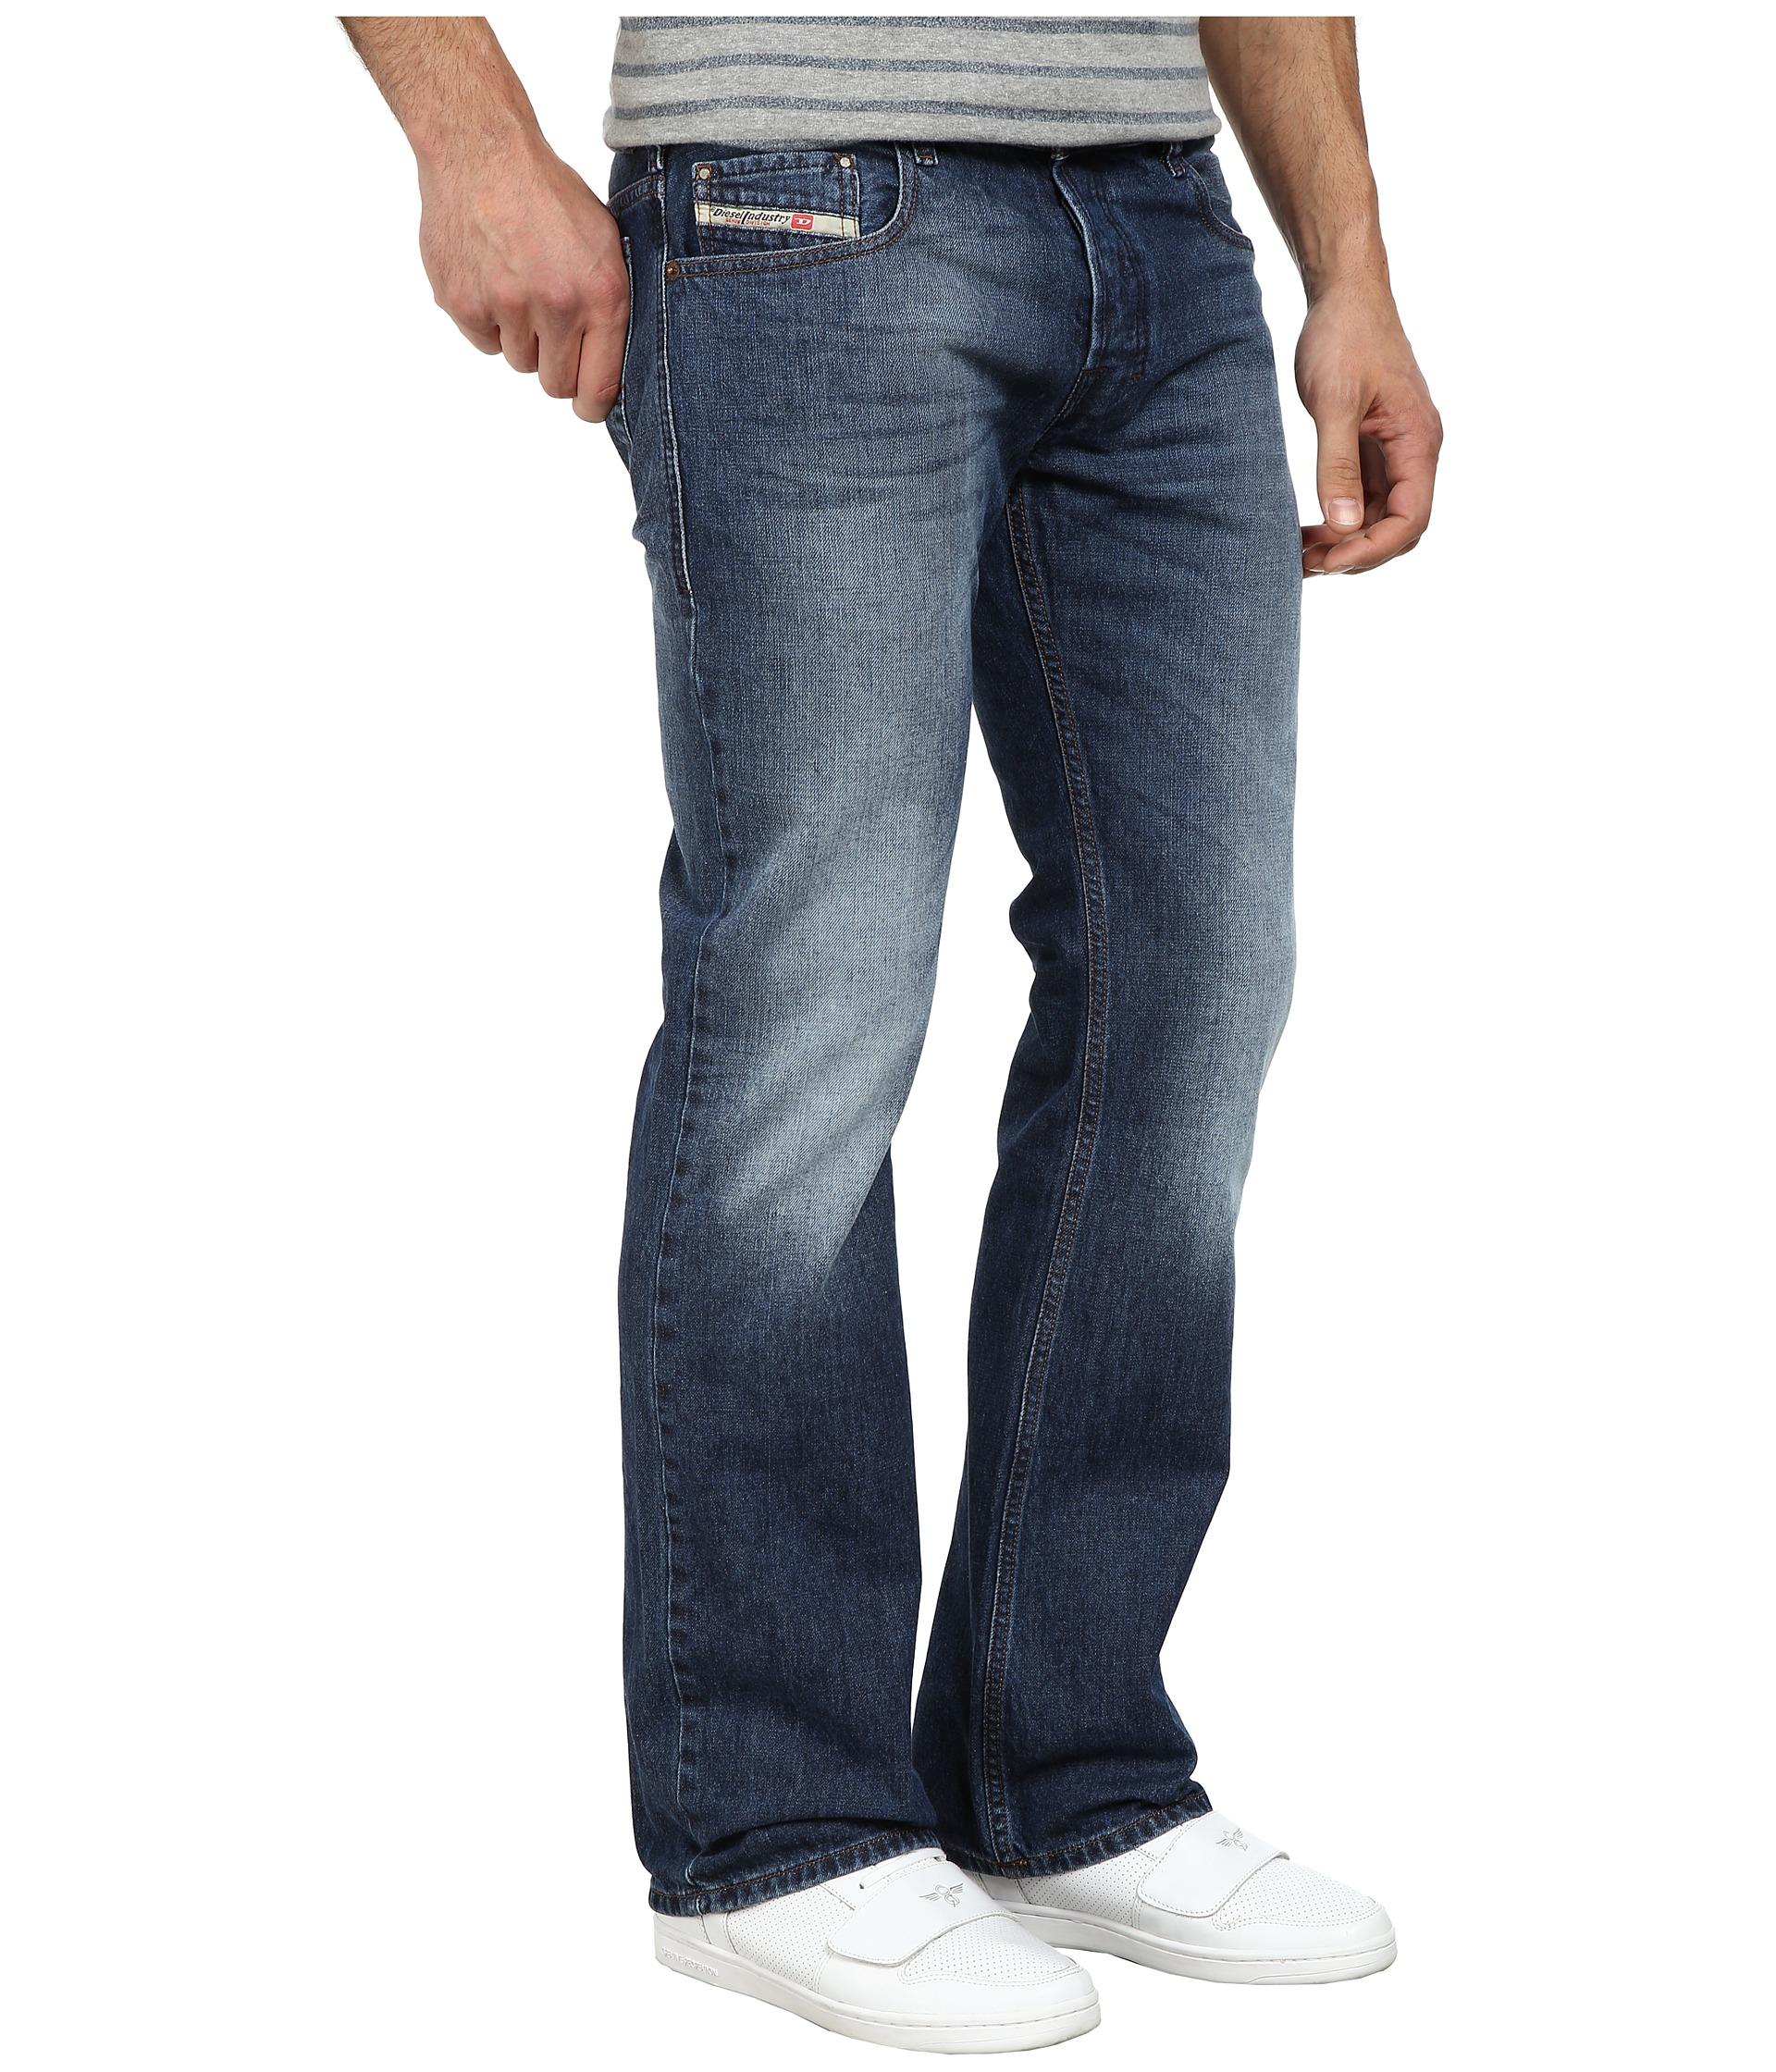 1be5c0b8 DIESEL Zatiny Trousers 842c in Blue for Men - Lyst